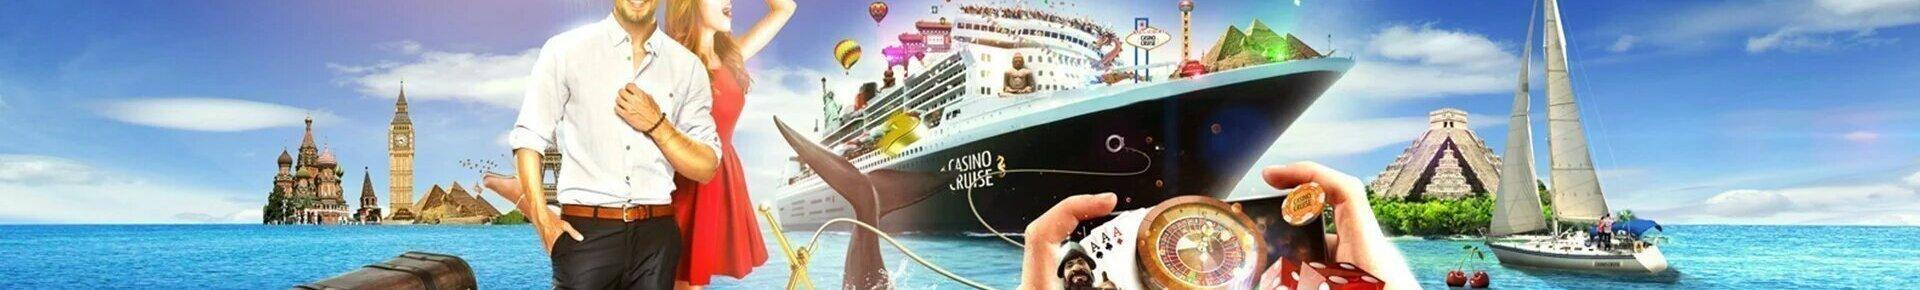 Casino Cruise casino review NZ